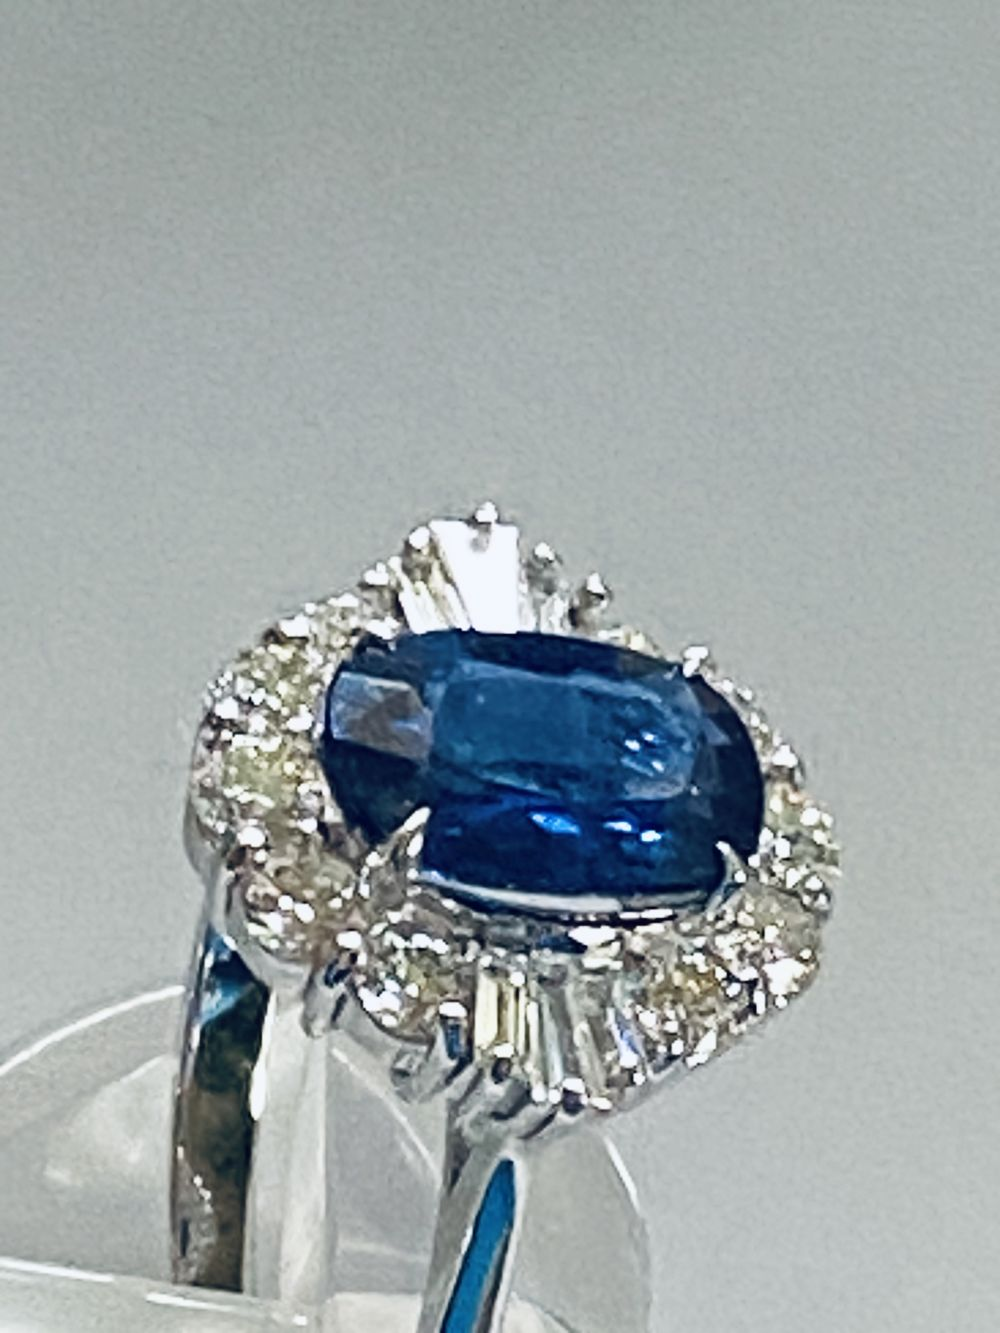 ART DECO DIAMOND AND CEYLON SAPPHIRE CLUSTER RING - Image 5 of 7